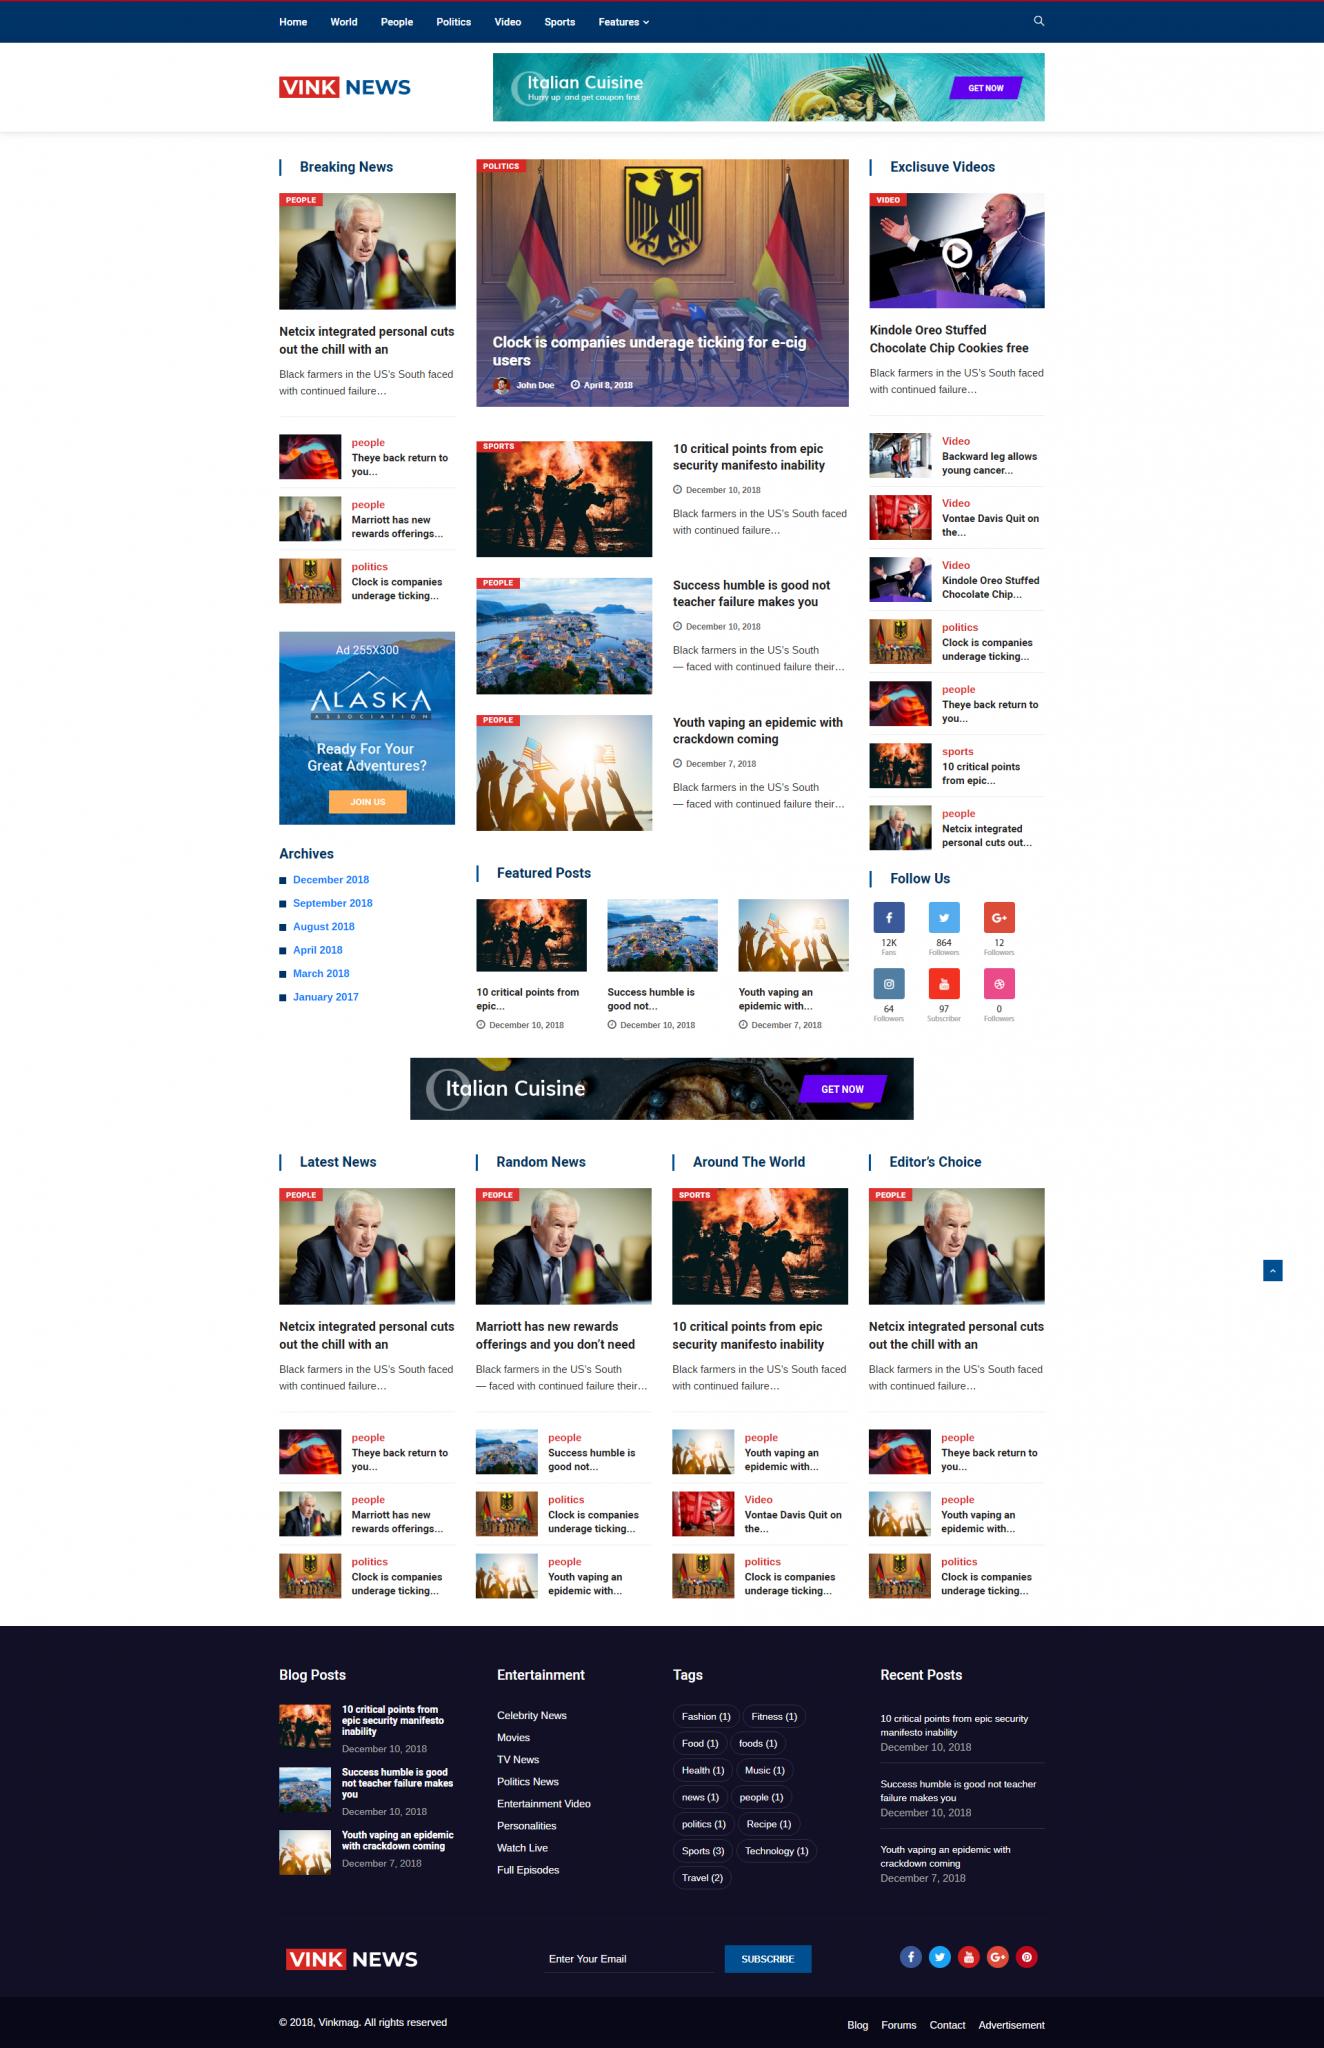 Mẫu web tin tức Vink news